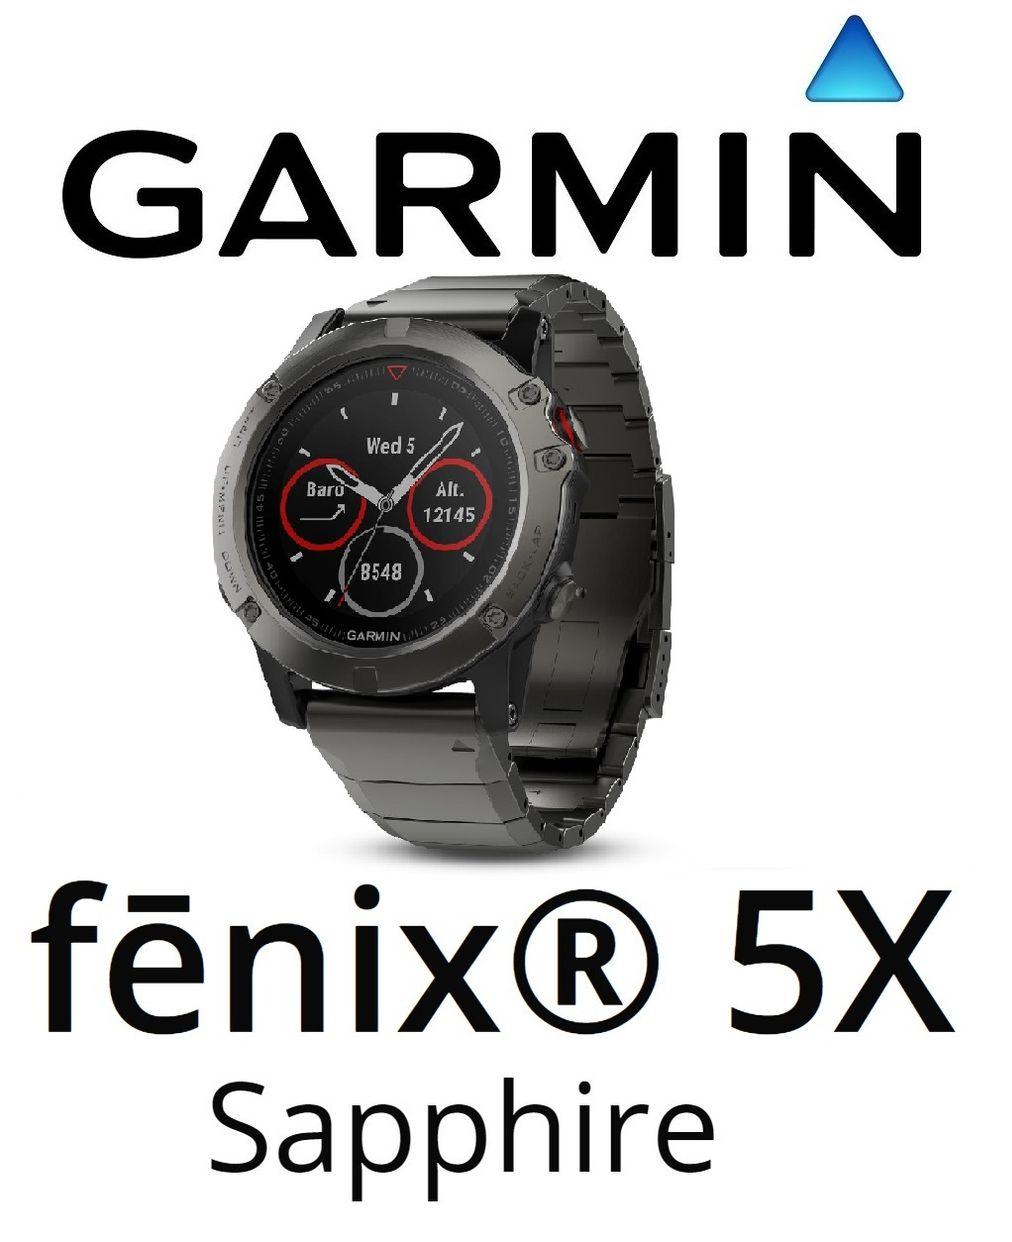 Garmin Fenix 5x Slate Gray Sapphire Gps Sport Wrist Hr Watch 51 Mm 5 Grey In The Box Fnix W Metal Band Charging Data Cable Documentation